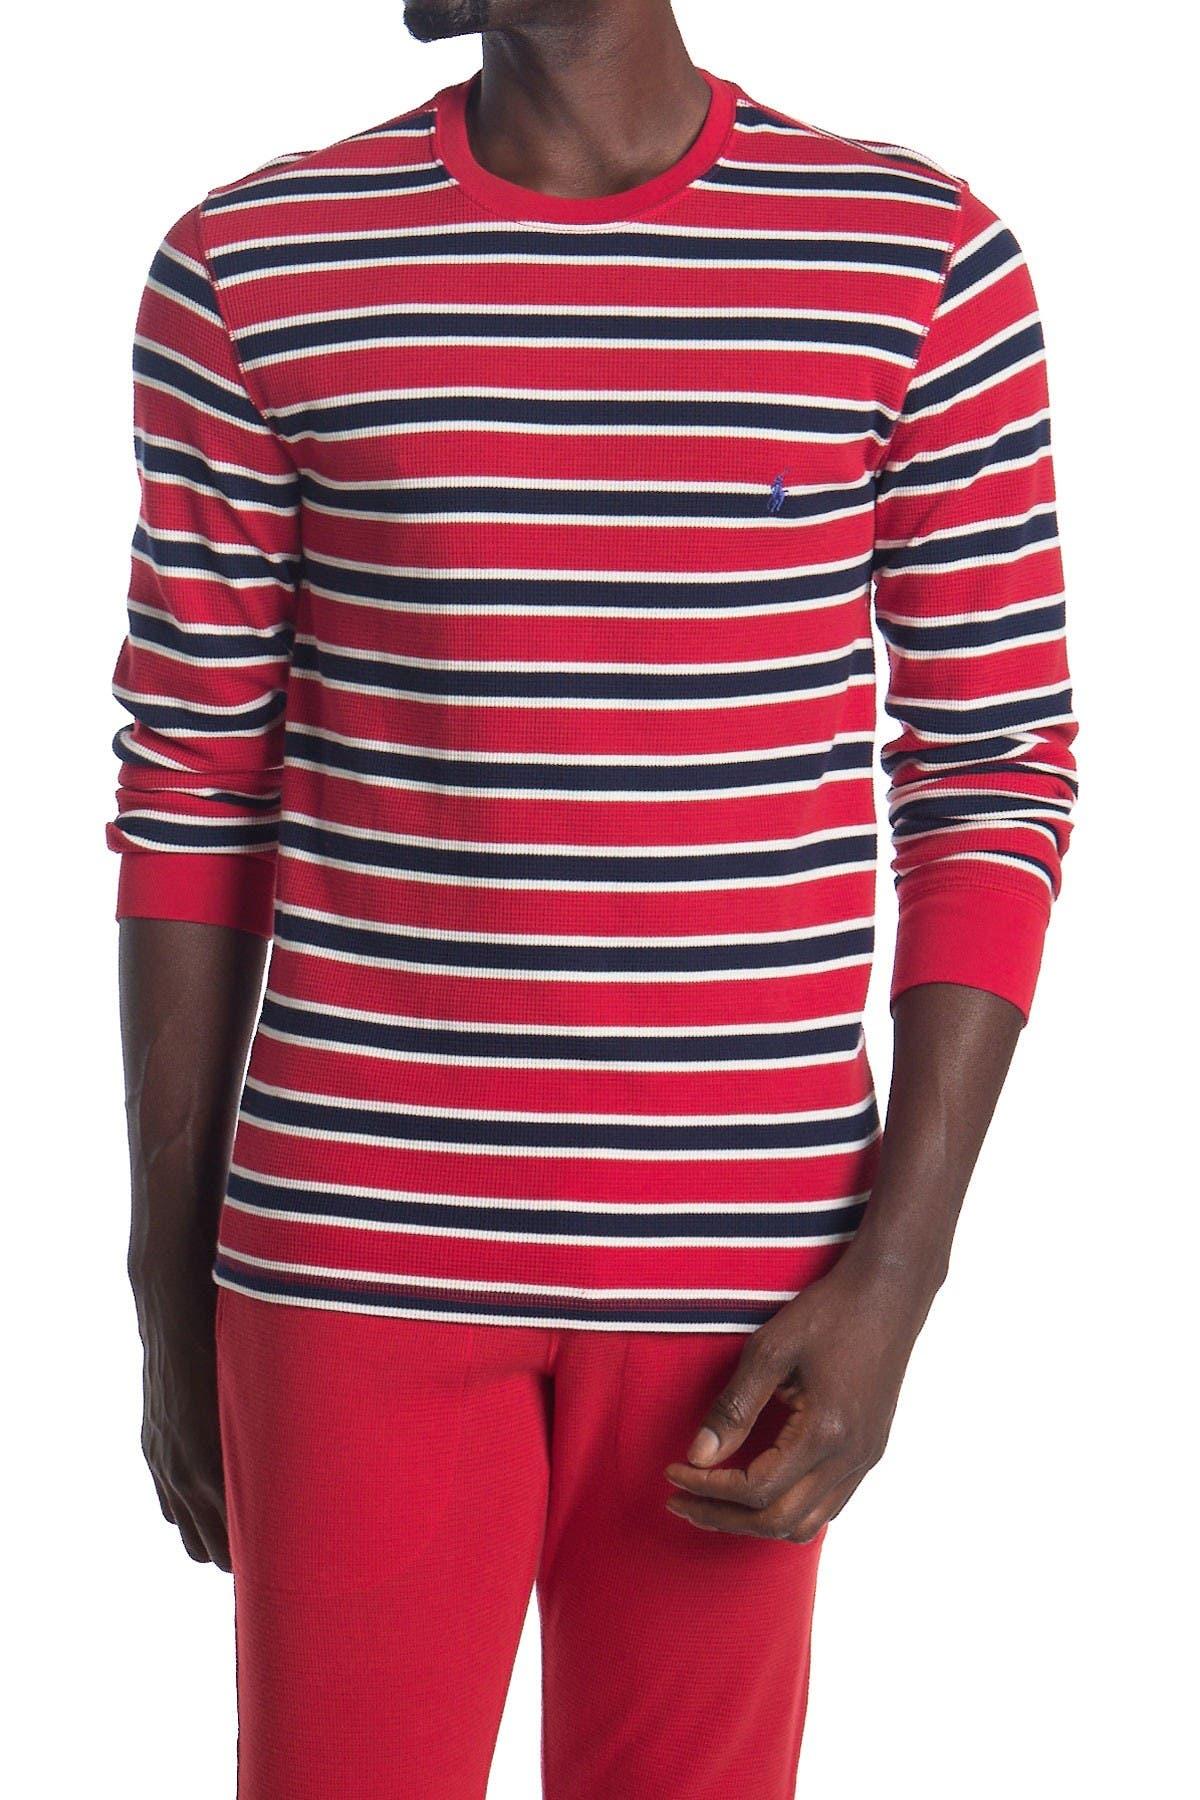 Image of Polo Waffle Knit Stripe Sweater